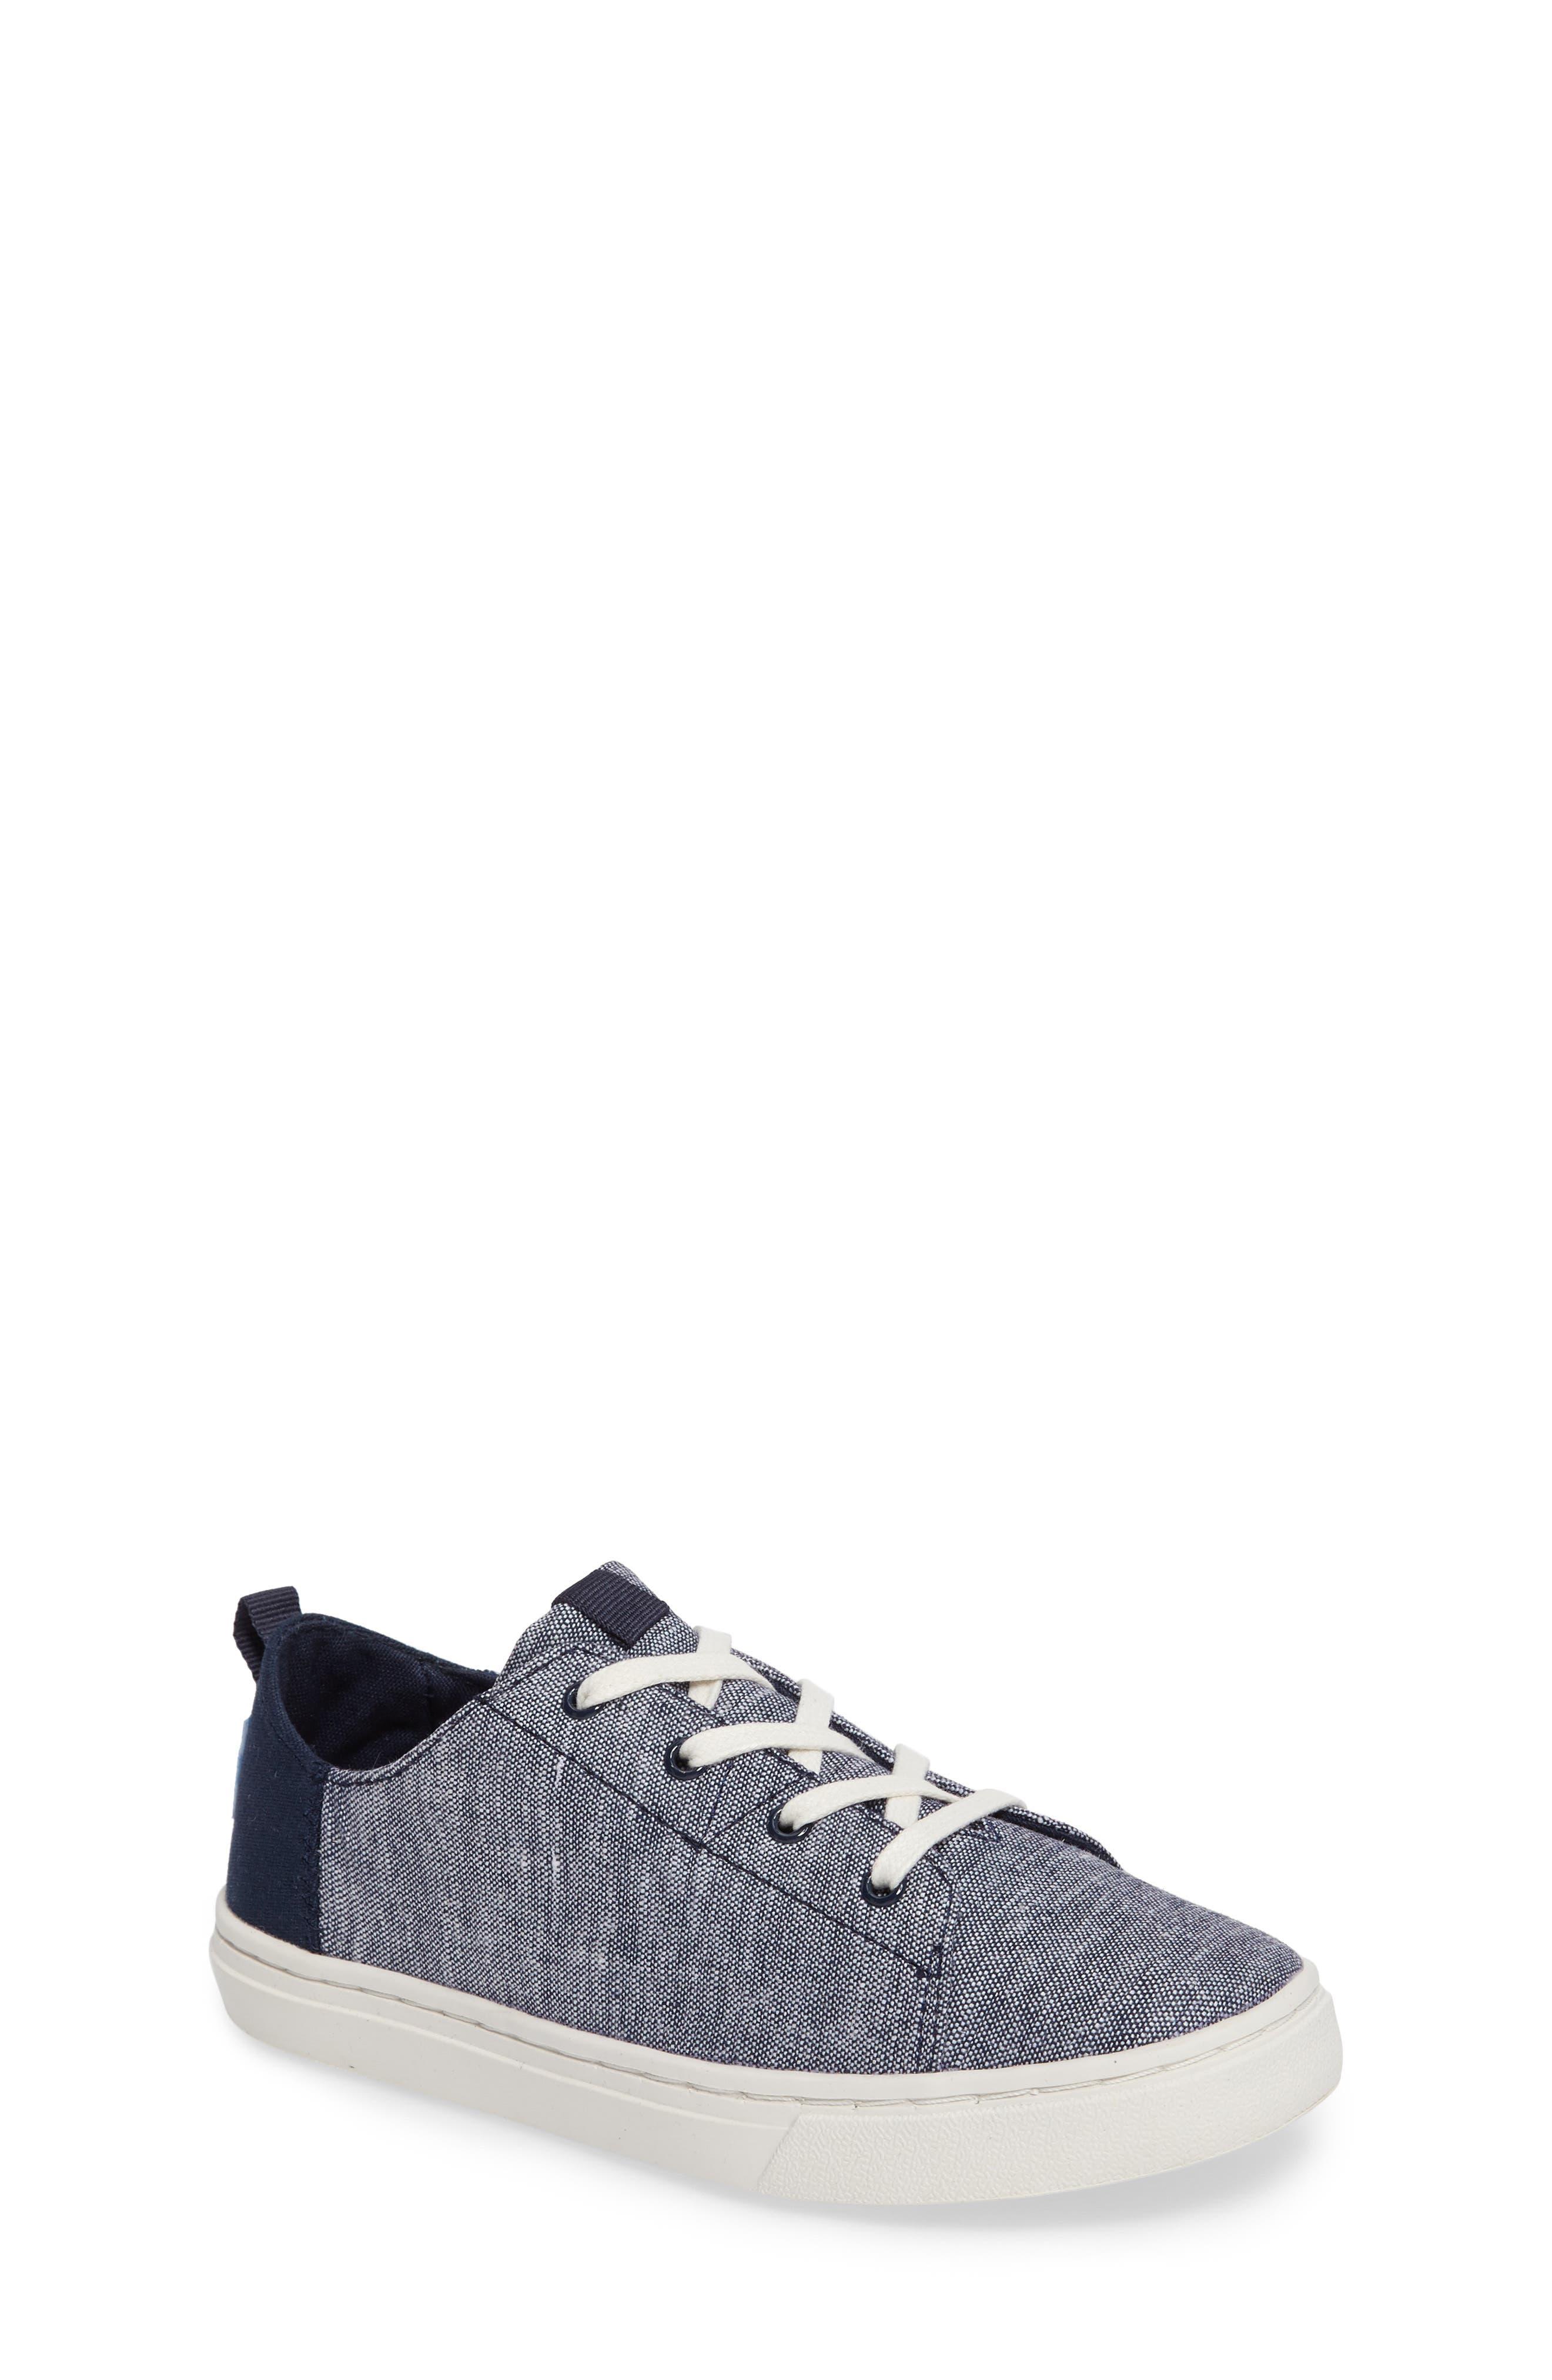 TOMS Lenny Sneaker (Baby, Walker, Toddler, Little Kid & Big Kid)